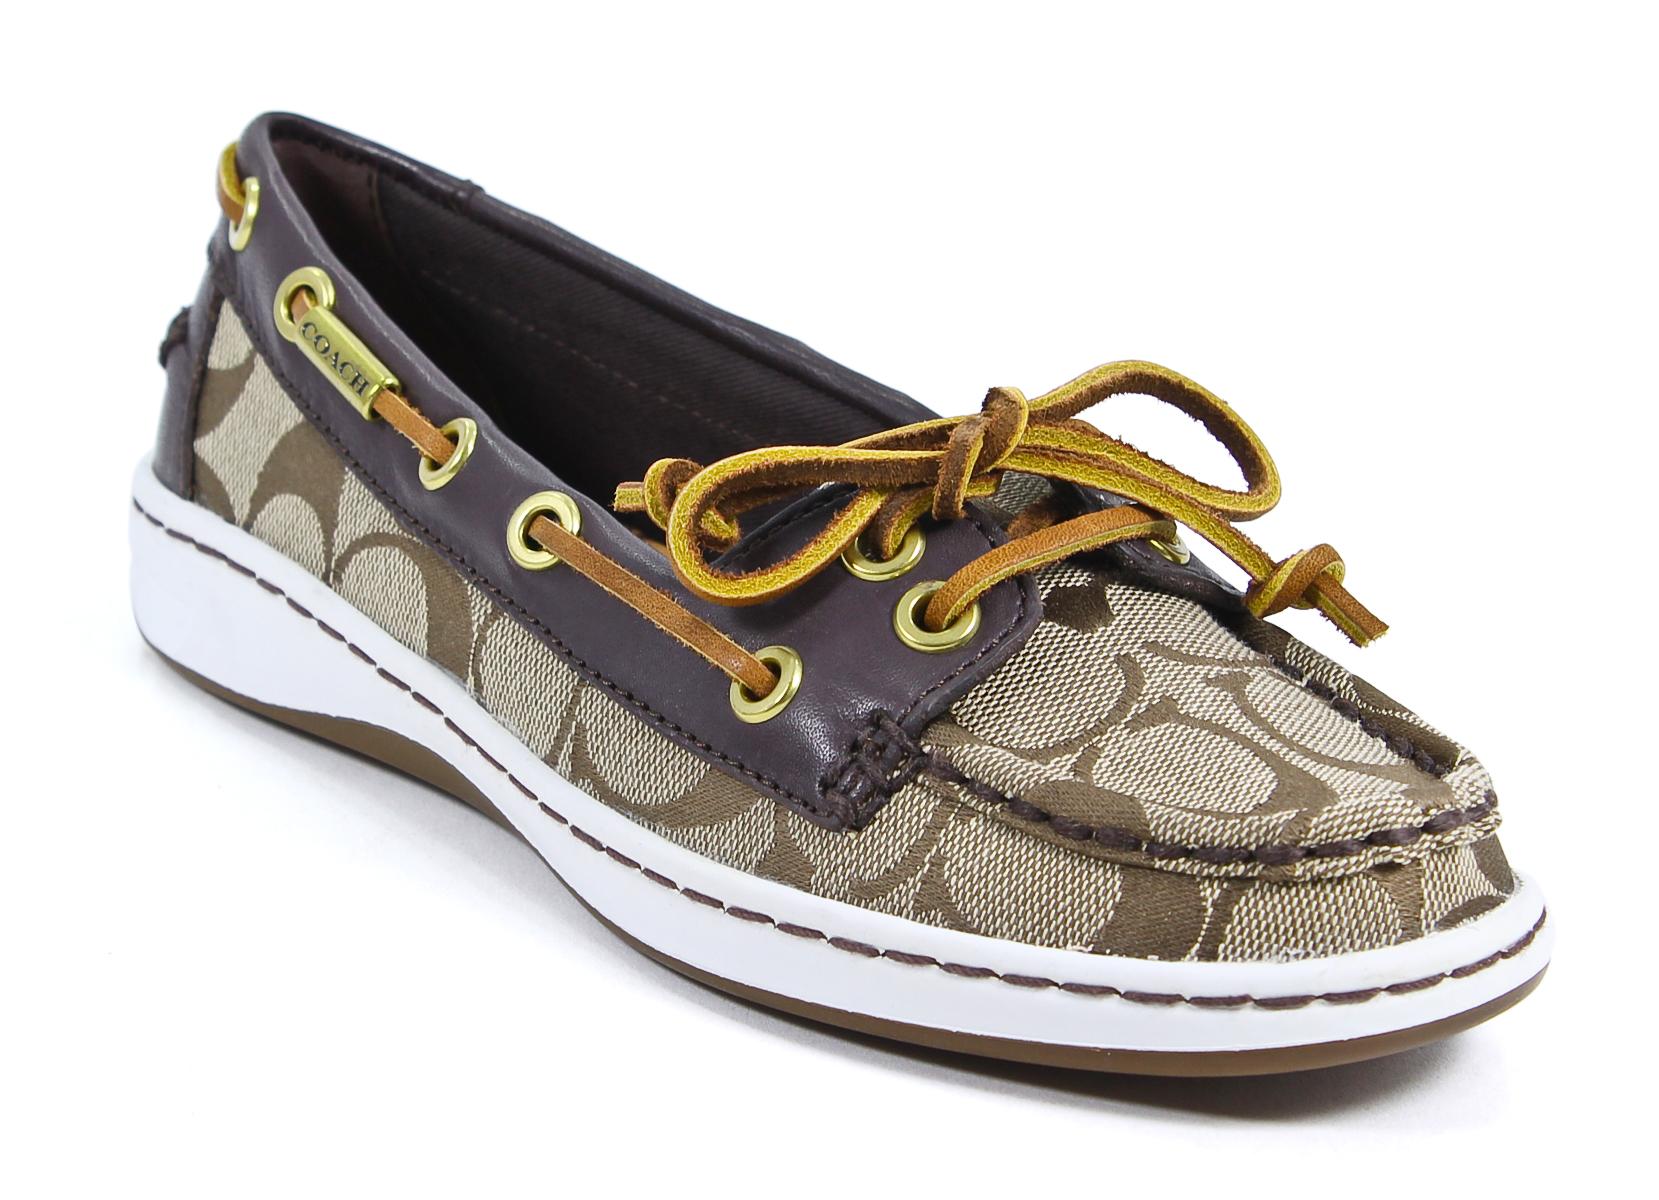 Dansko Shoes Jessica